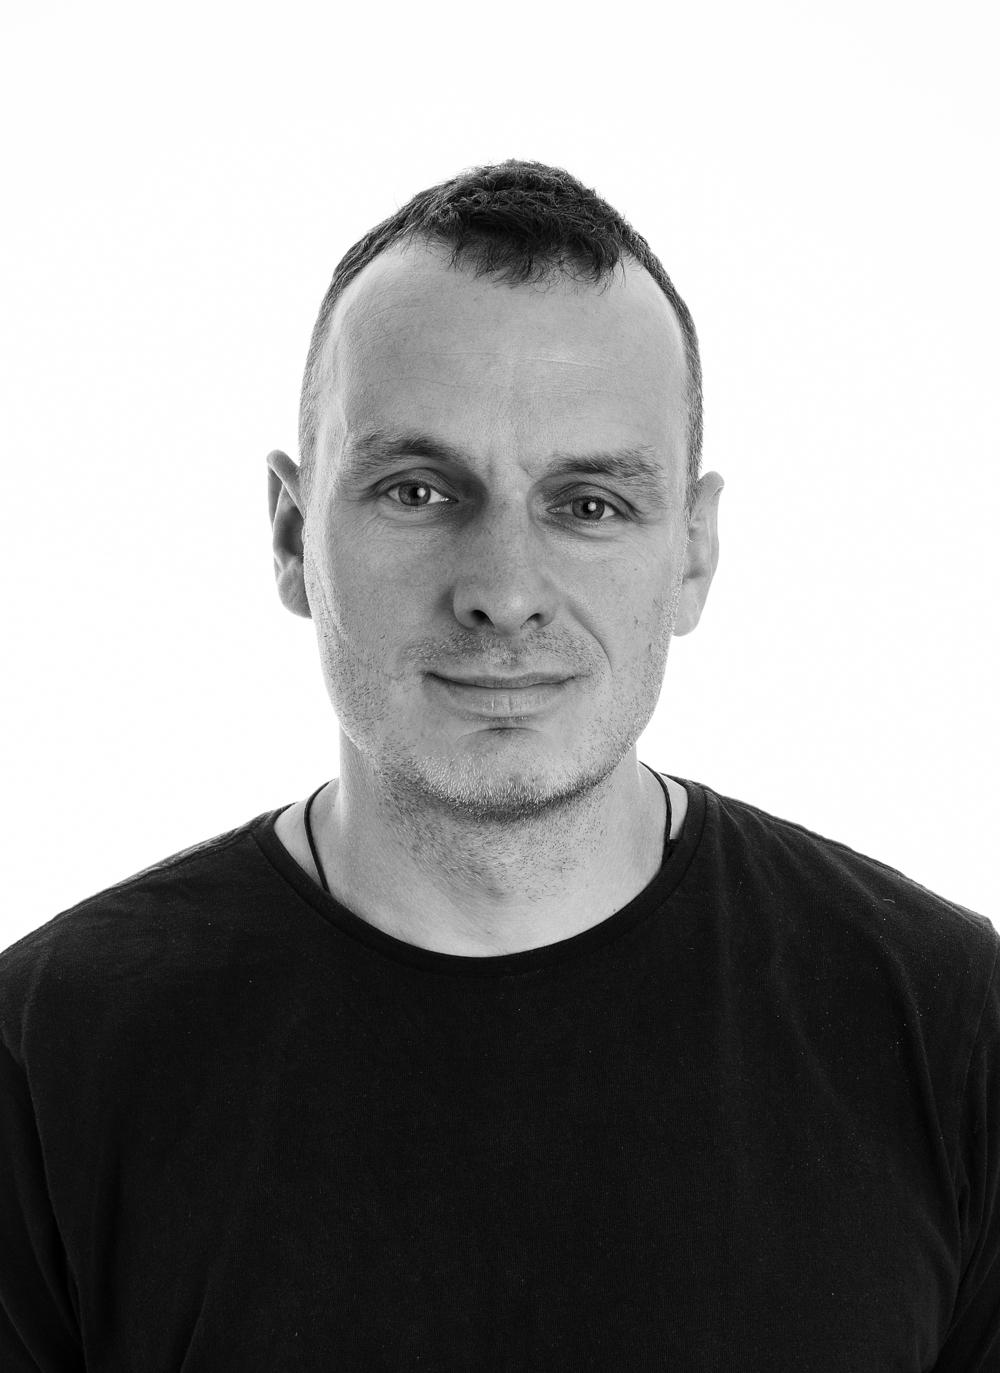 MICHAL KASPRZAK  Tlf.: +47 939 39 416